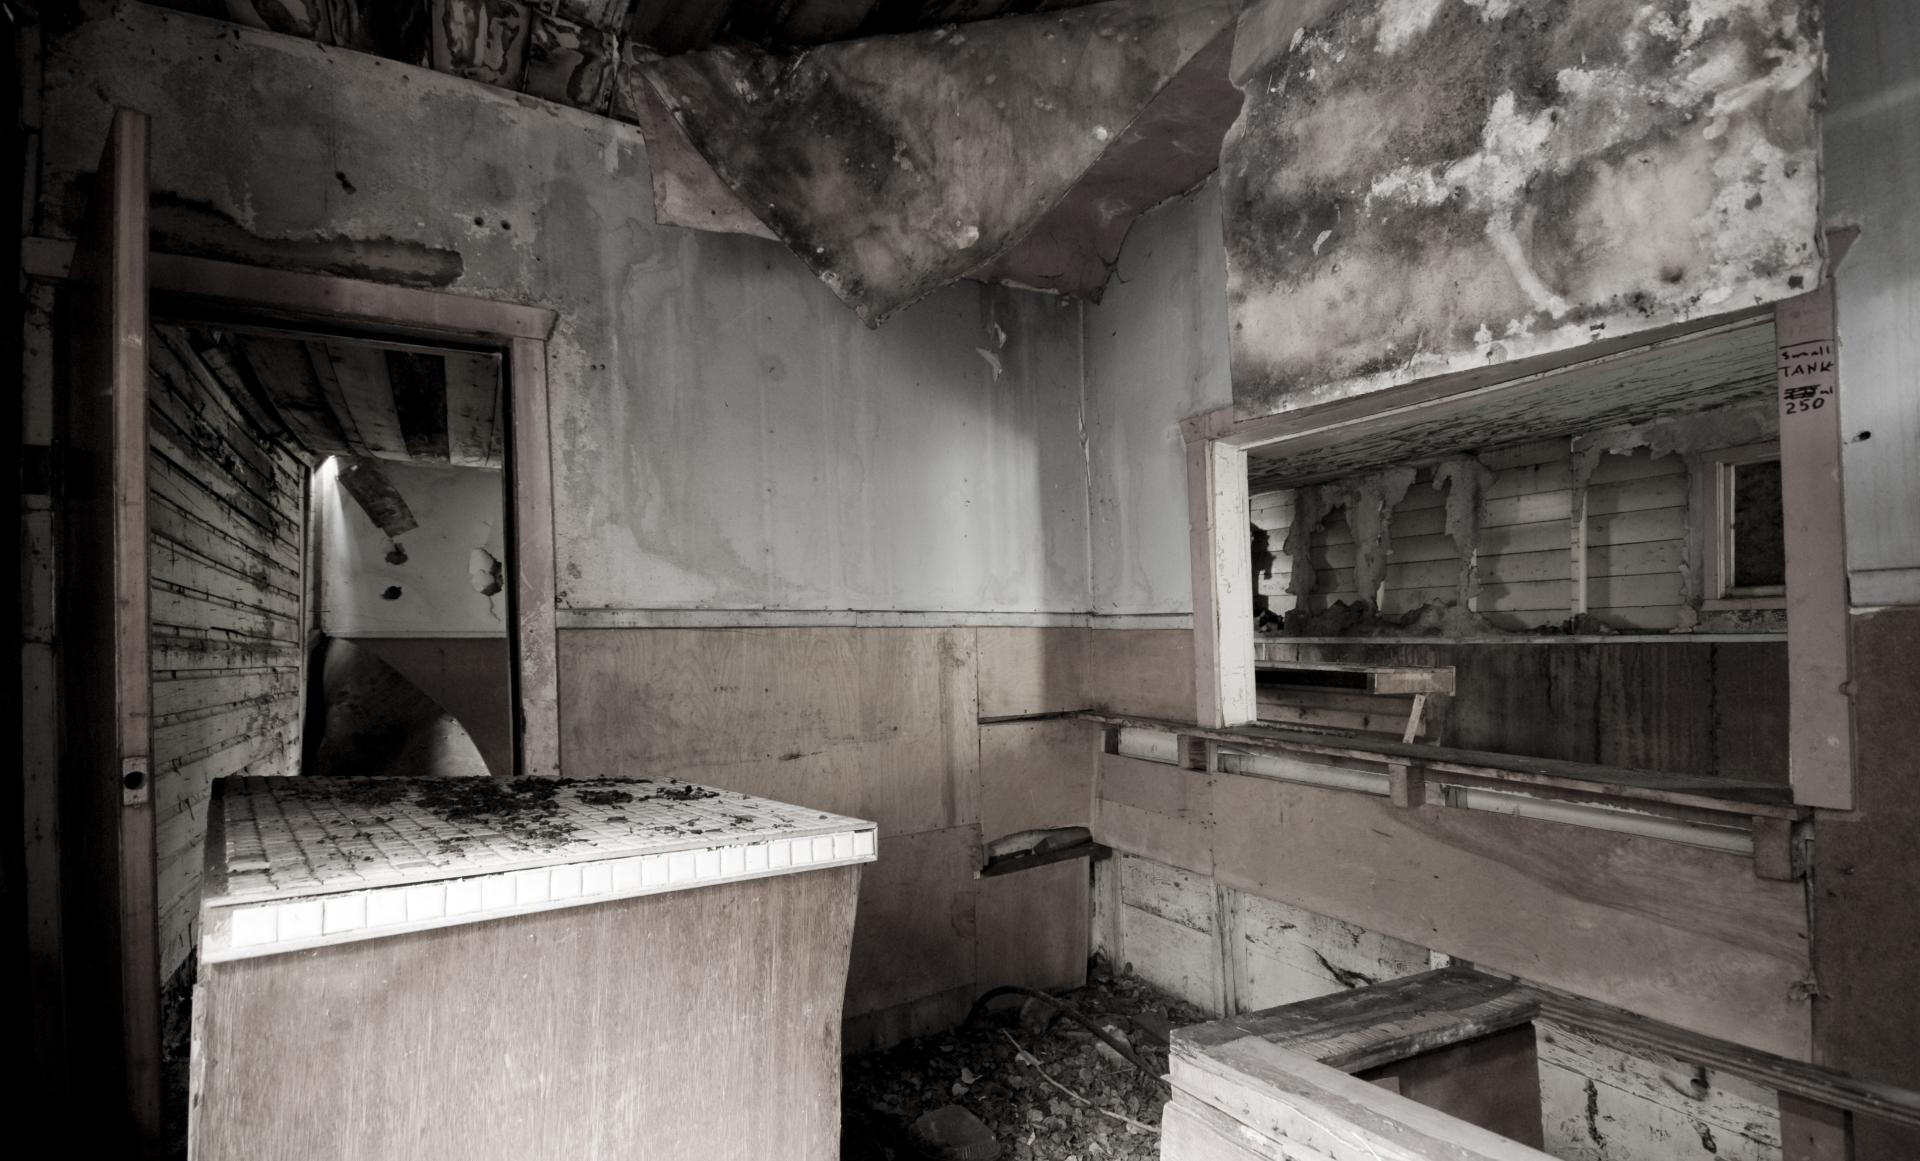 A Forlorn Kitchen